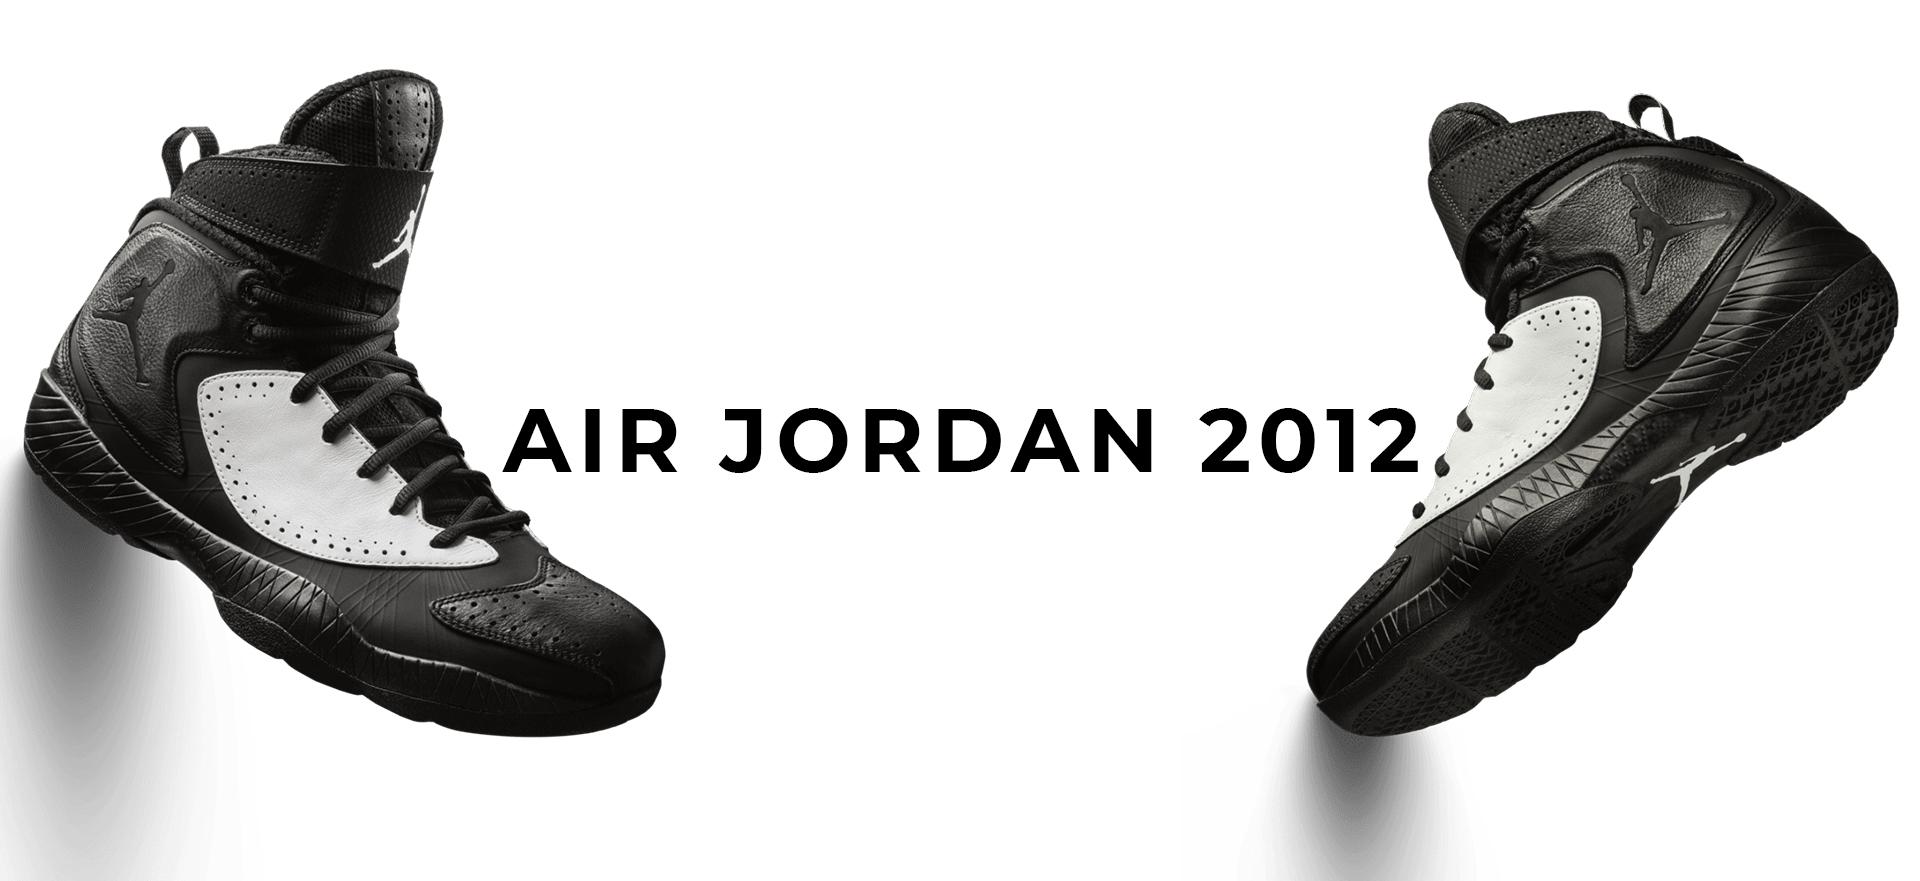 Air Jordan 2012 — mcmag.ru — все модели джордан